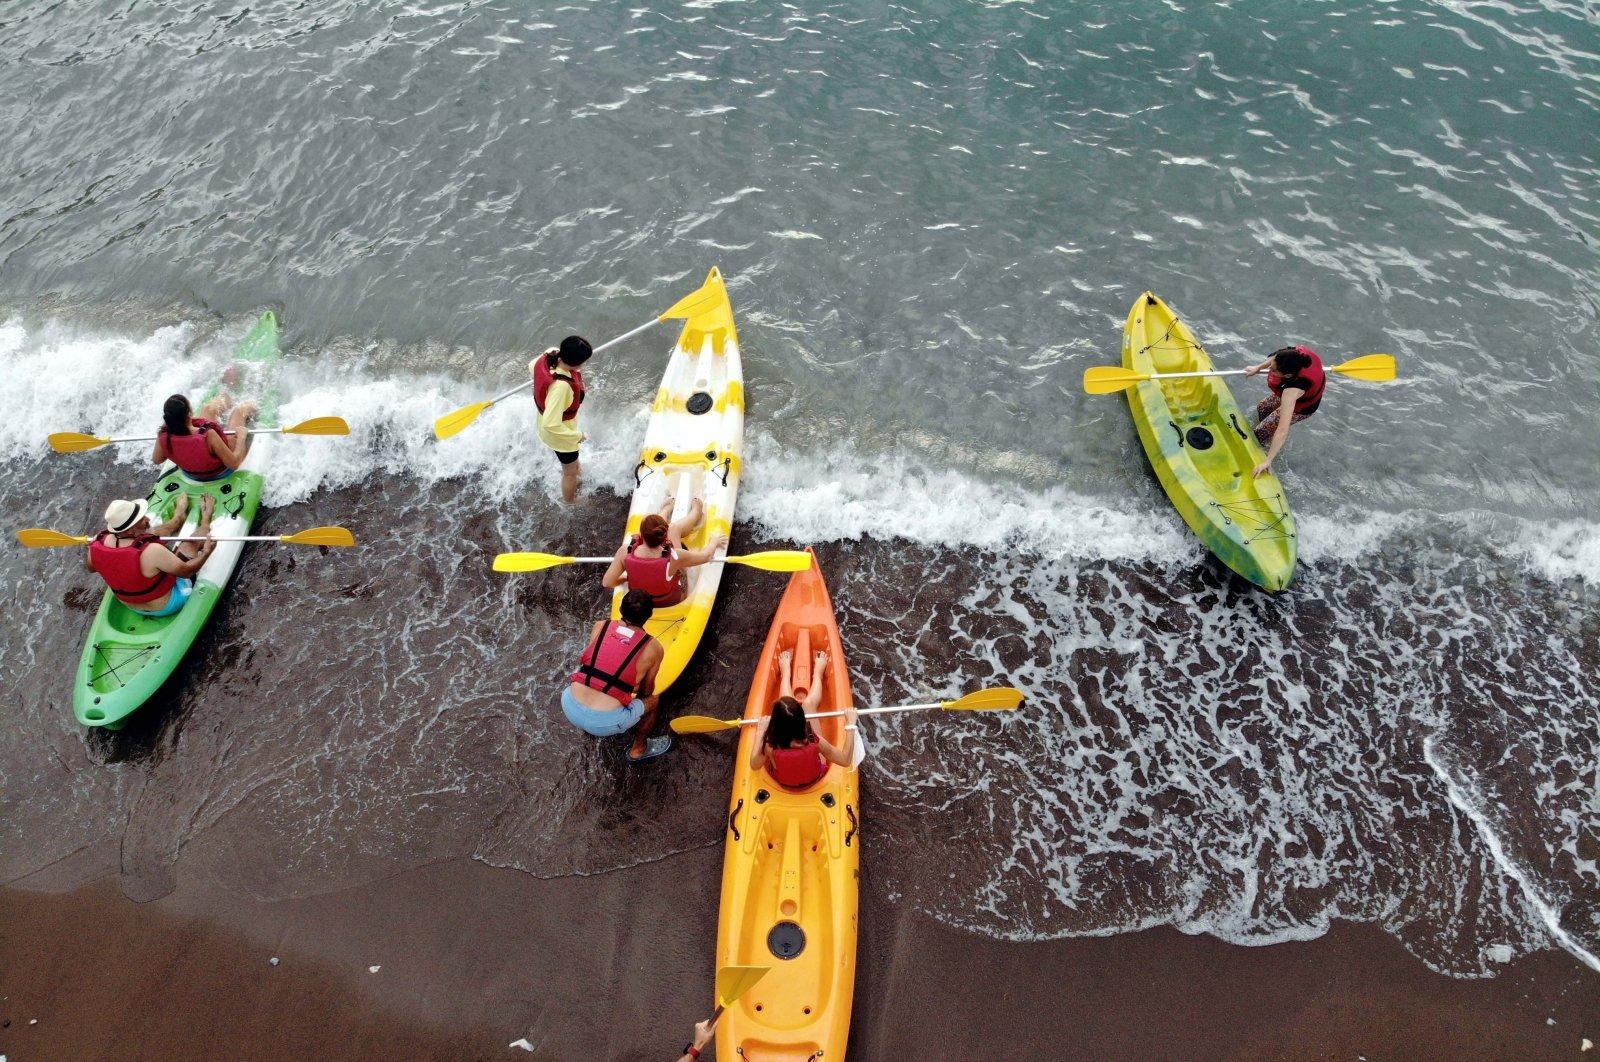 Russian bloggers enjoy a canoe tour in Muğla province, southwestern Turkey, Sept. 16, 2021. (AA Photo)